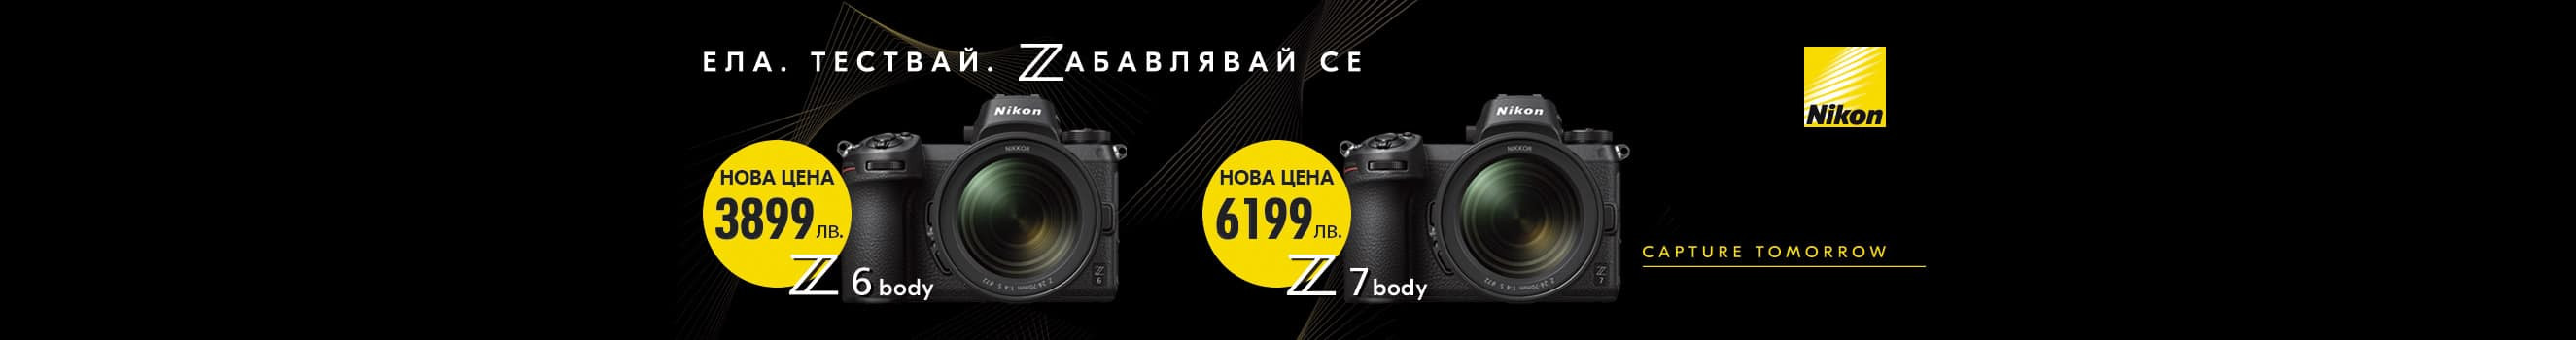 400 лв. отстъпка за обектив Nikkor Z при покупка на фотоапарат Nikon Z6 и Z7